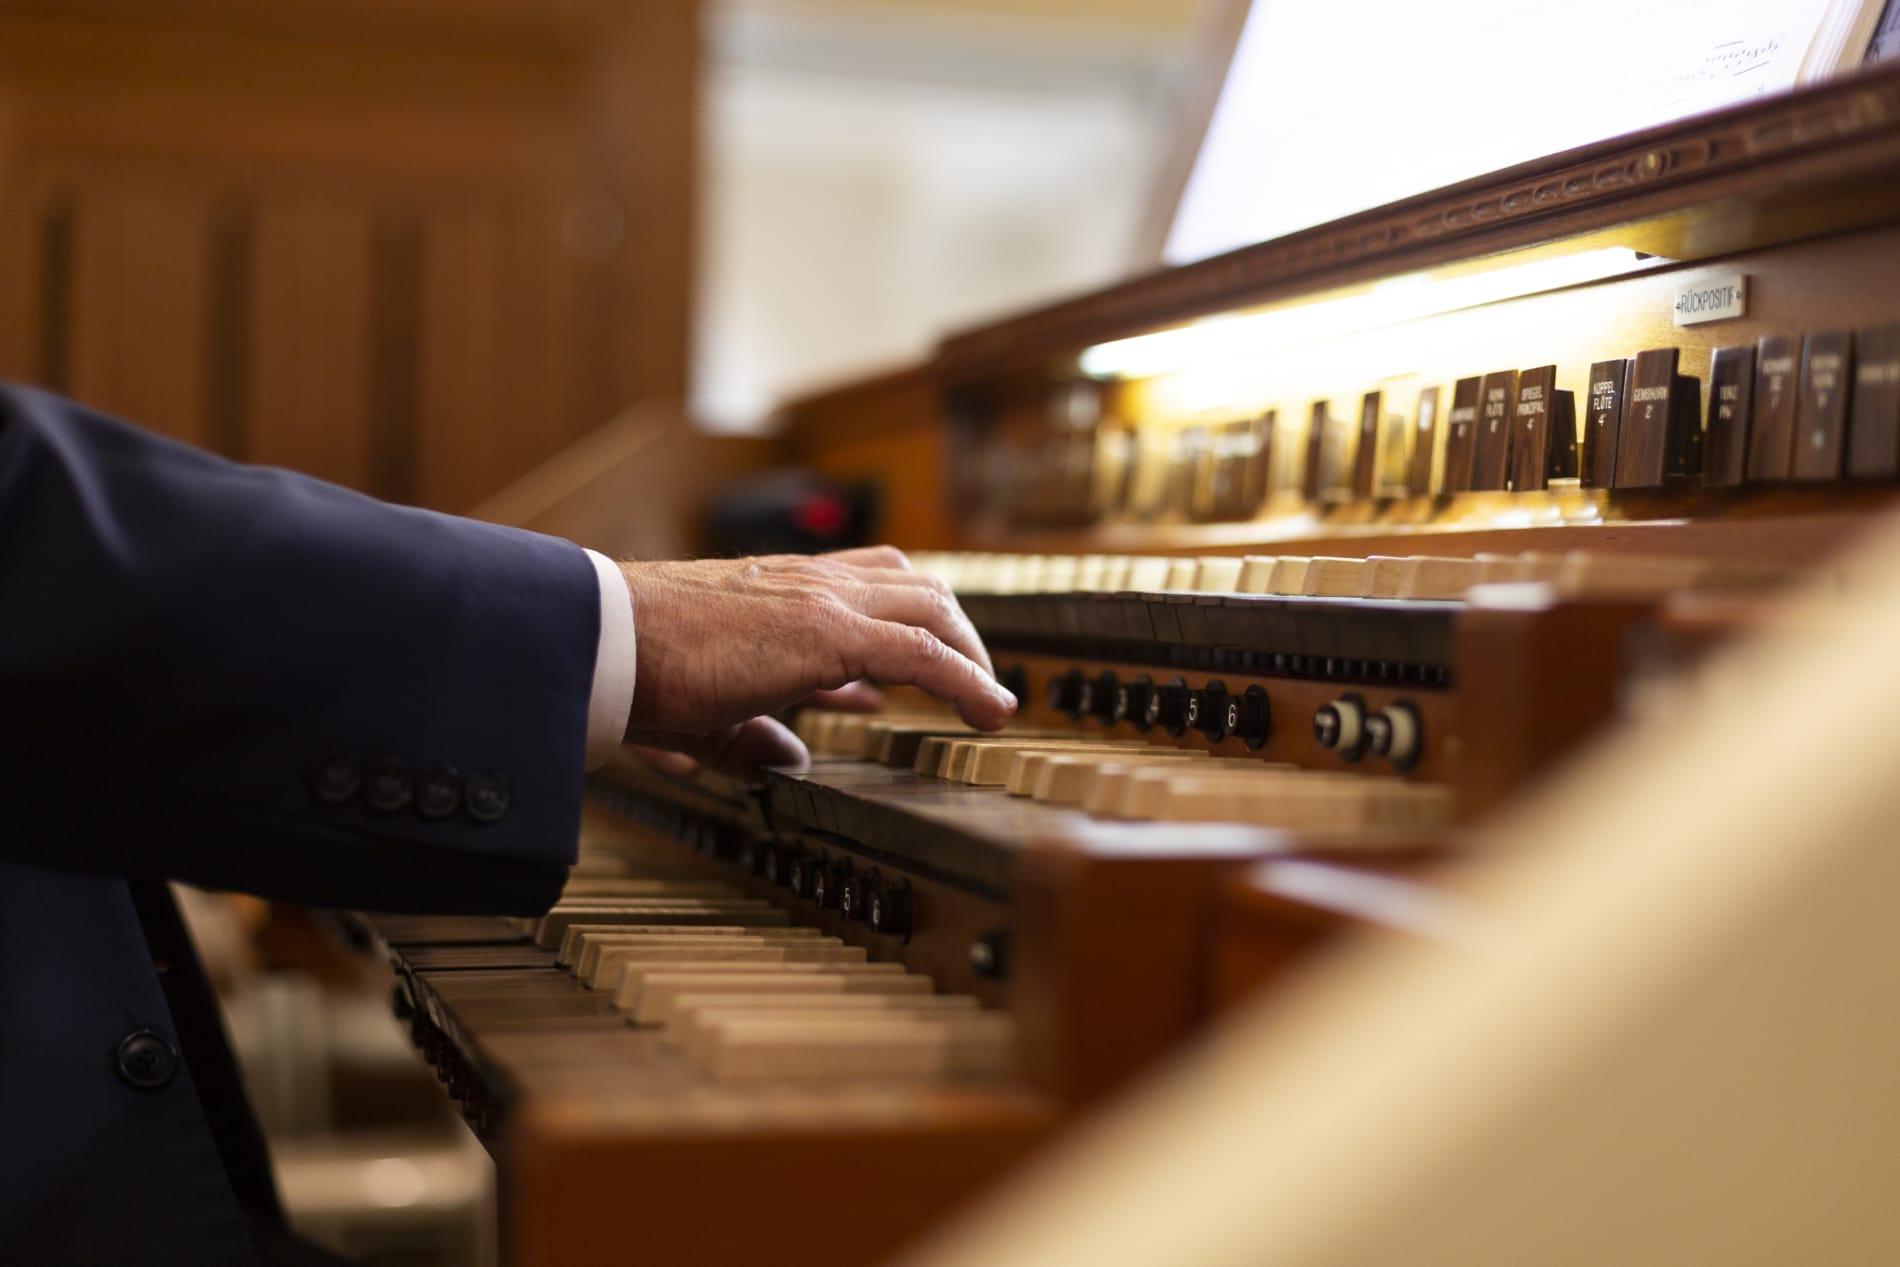 An organist plays the organ